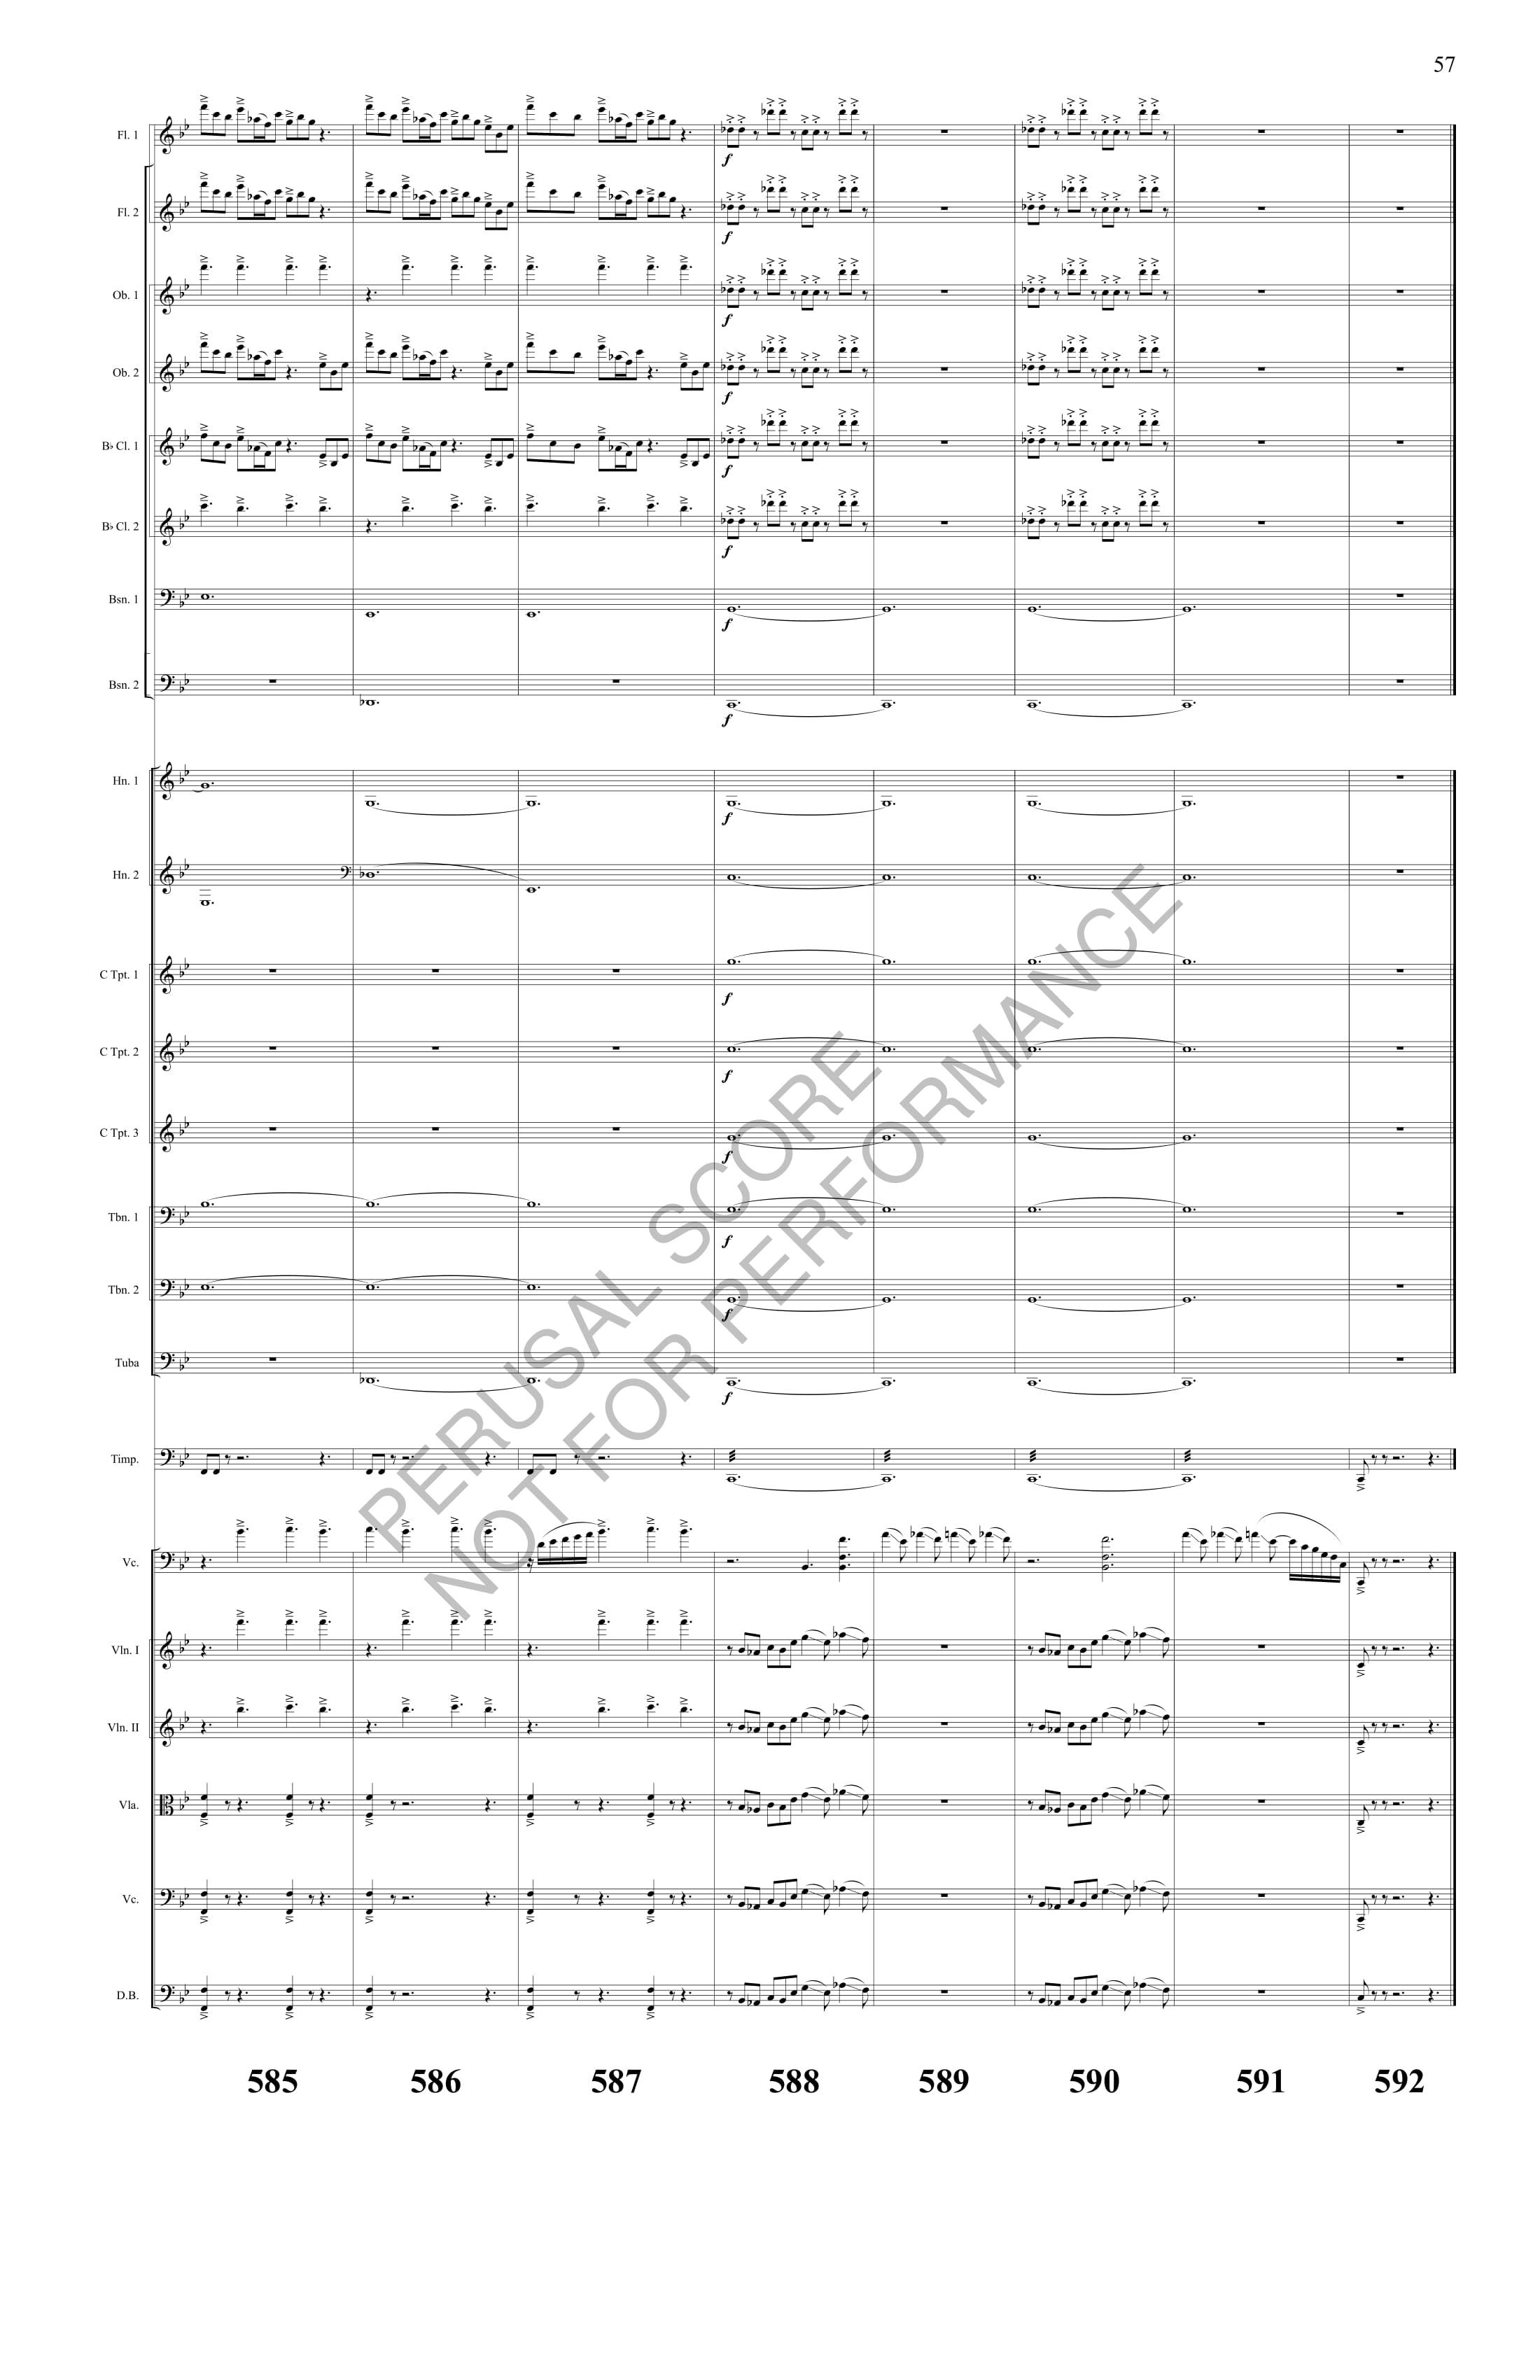 Boyd Tekton Score-watermark-63.jpg